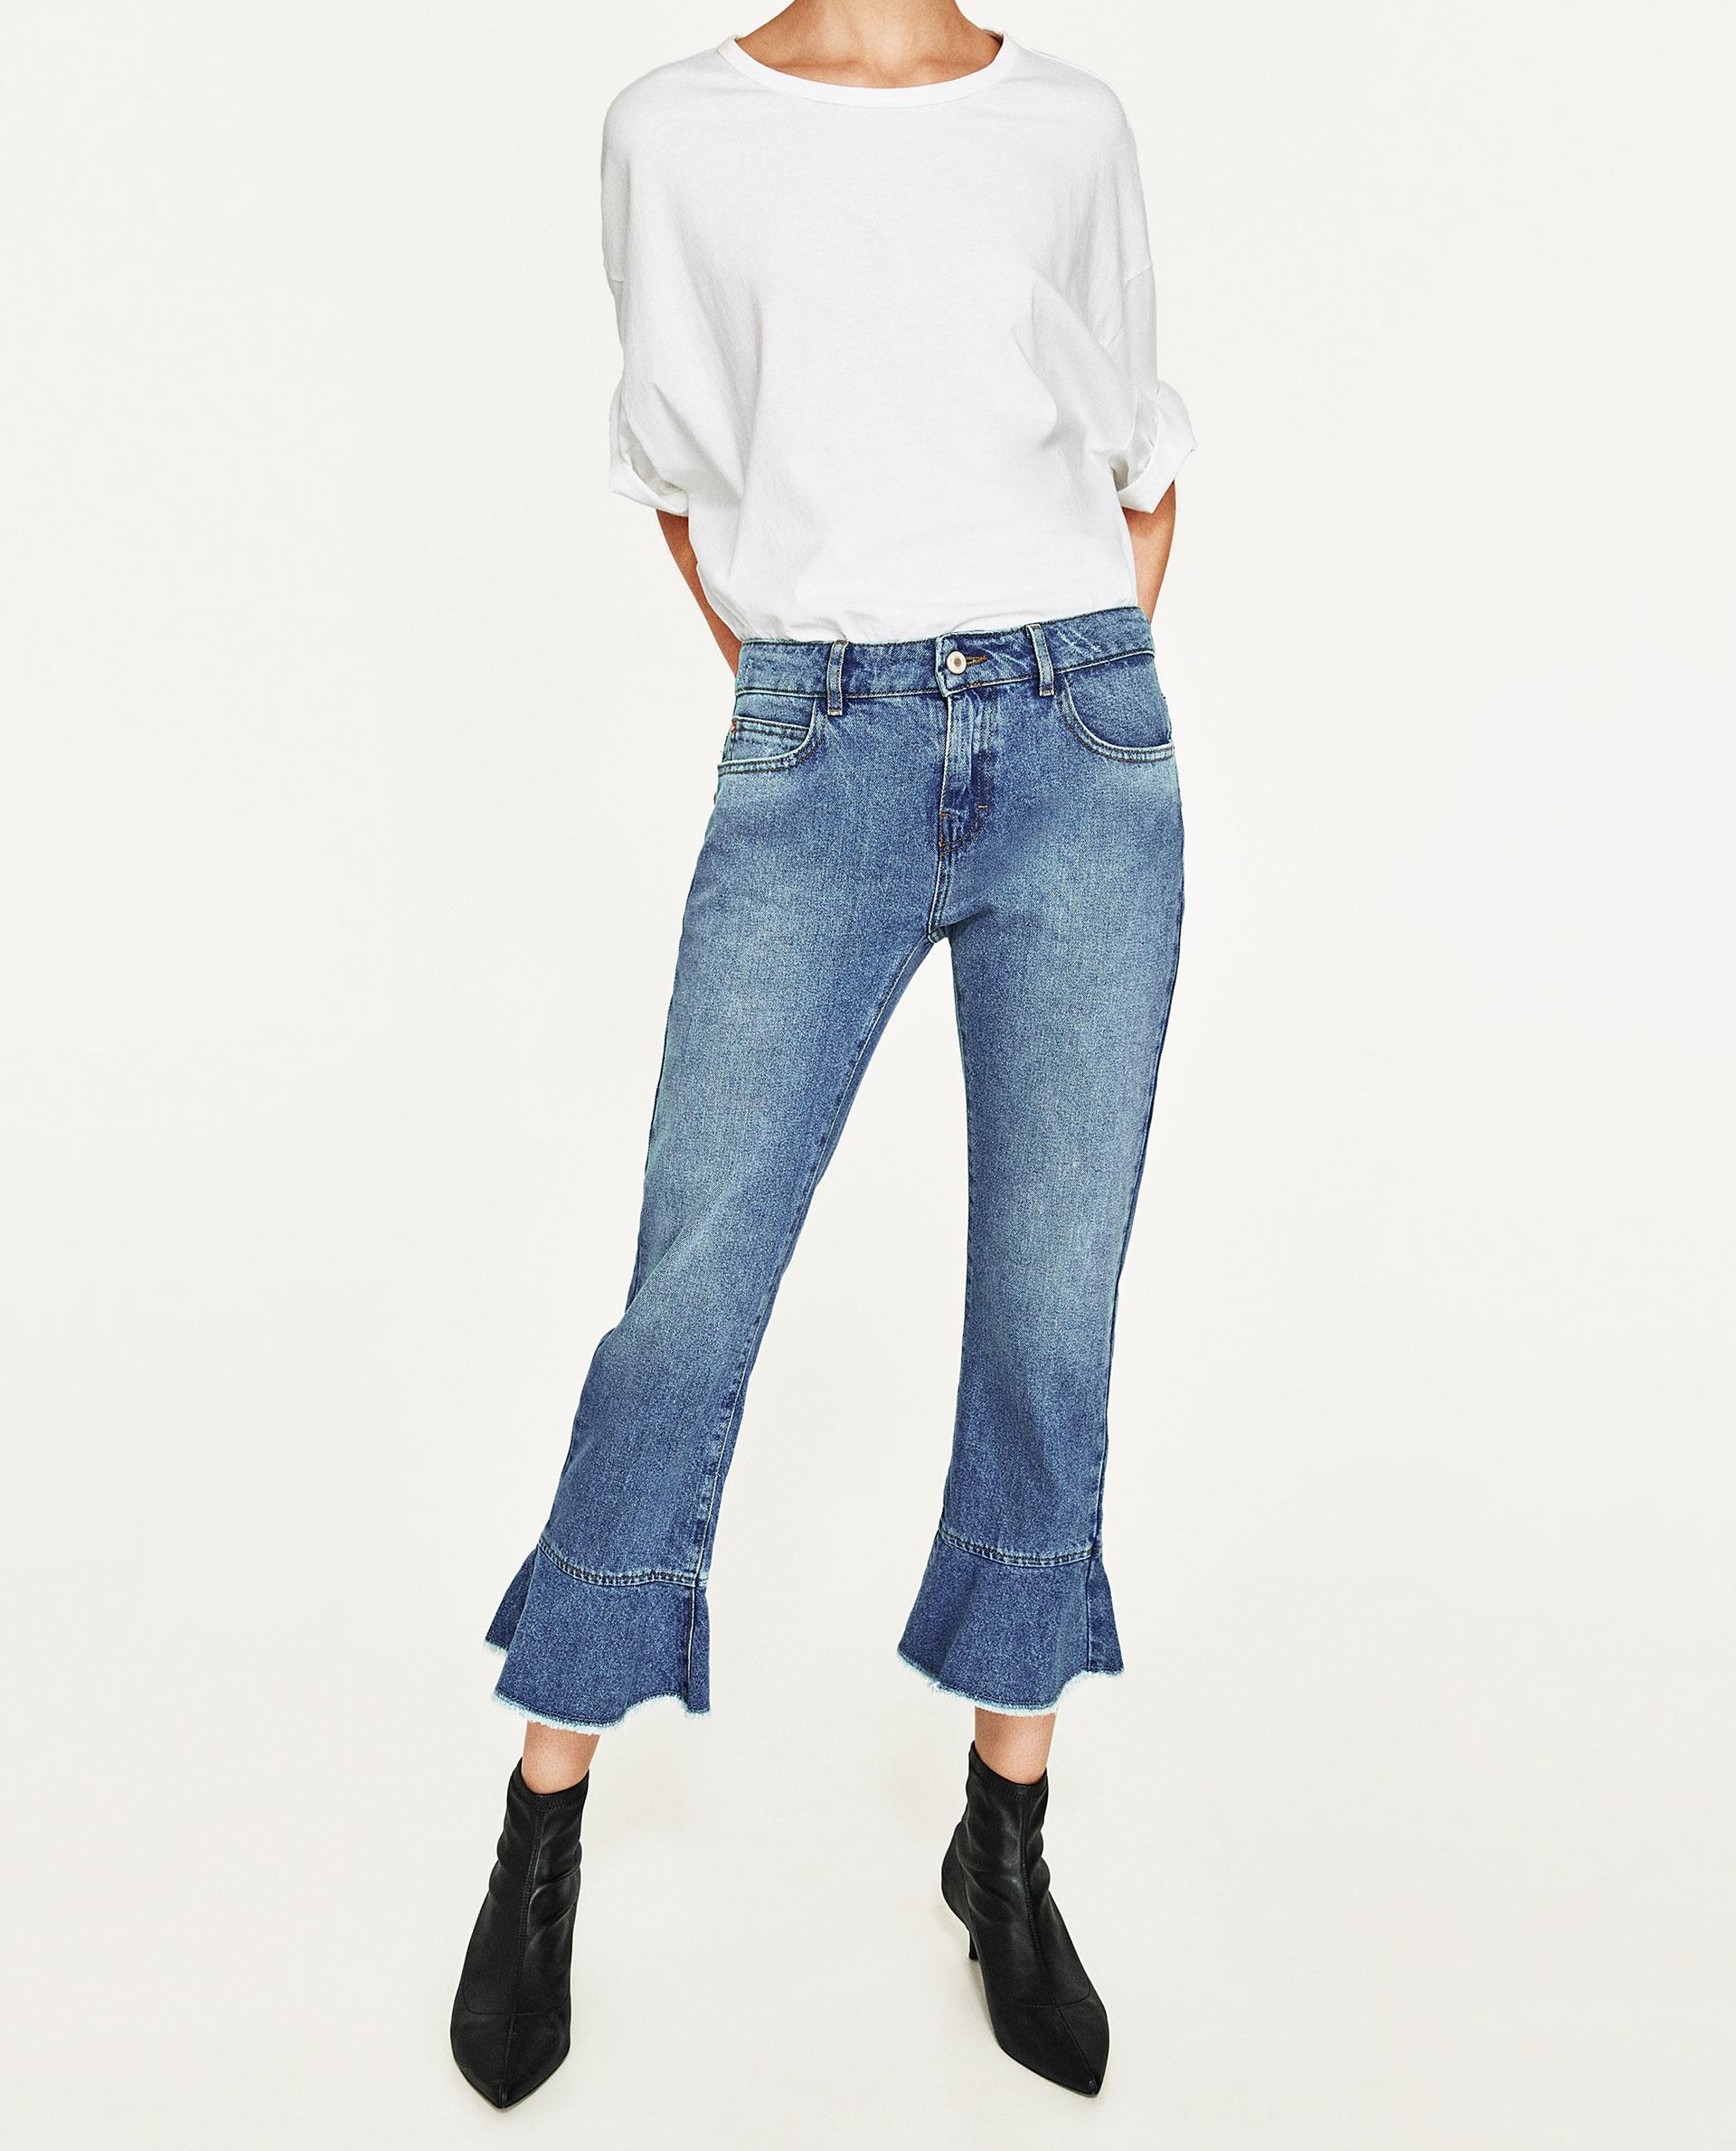 Éppen-csak-fodor, <a href='https://www.zara.com/hu/en/woman/jeans/view-all/mid-rise-jeans-with-frill-c719019p4246530.html' target='_blank'>Zara</a></p>